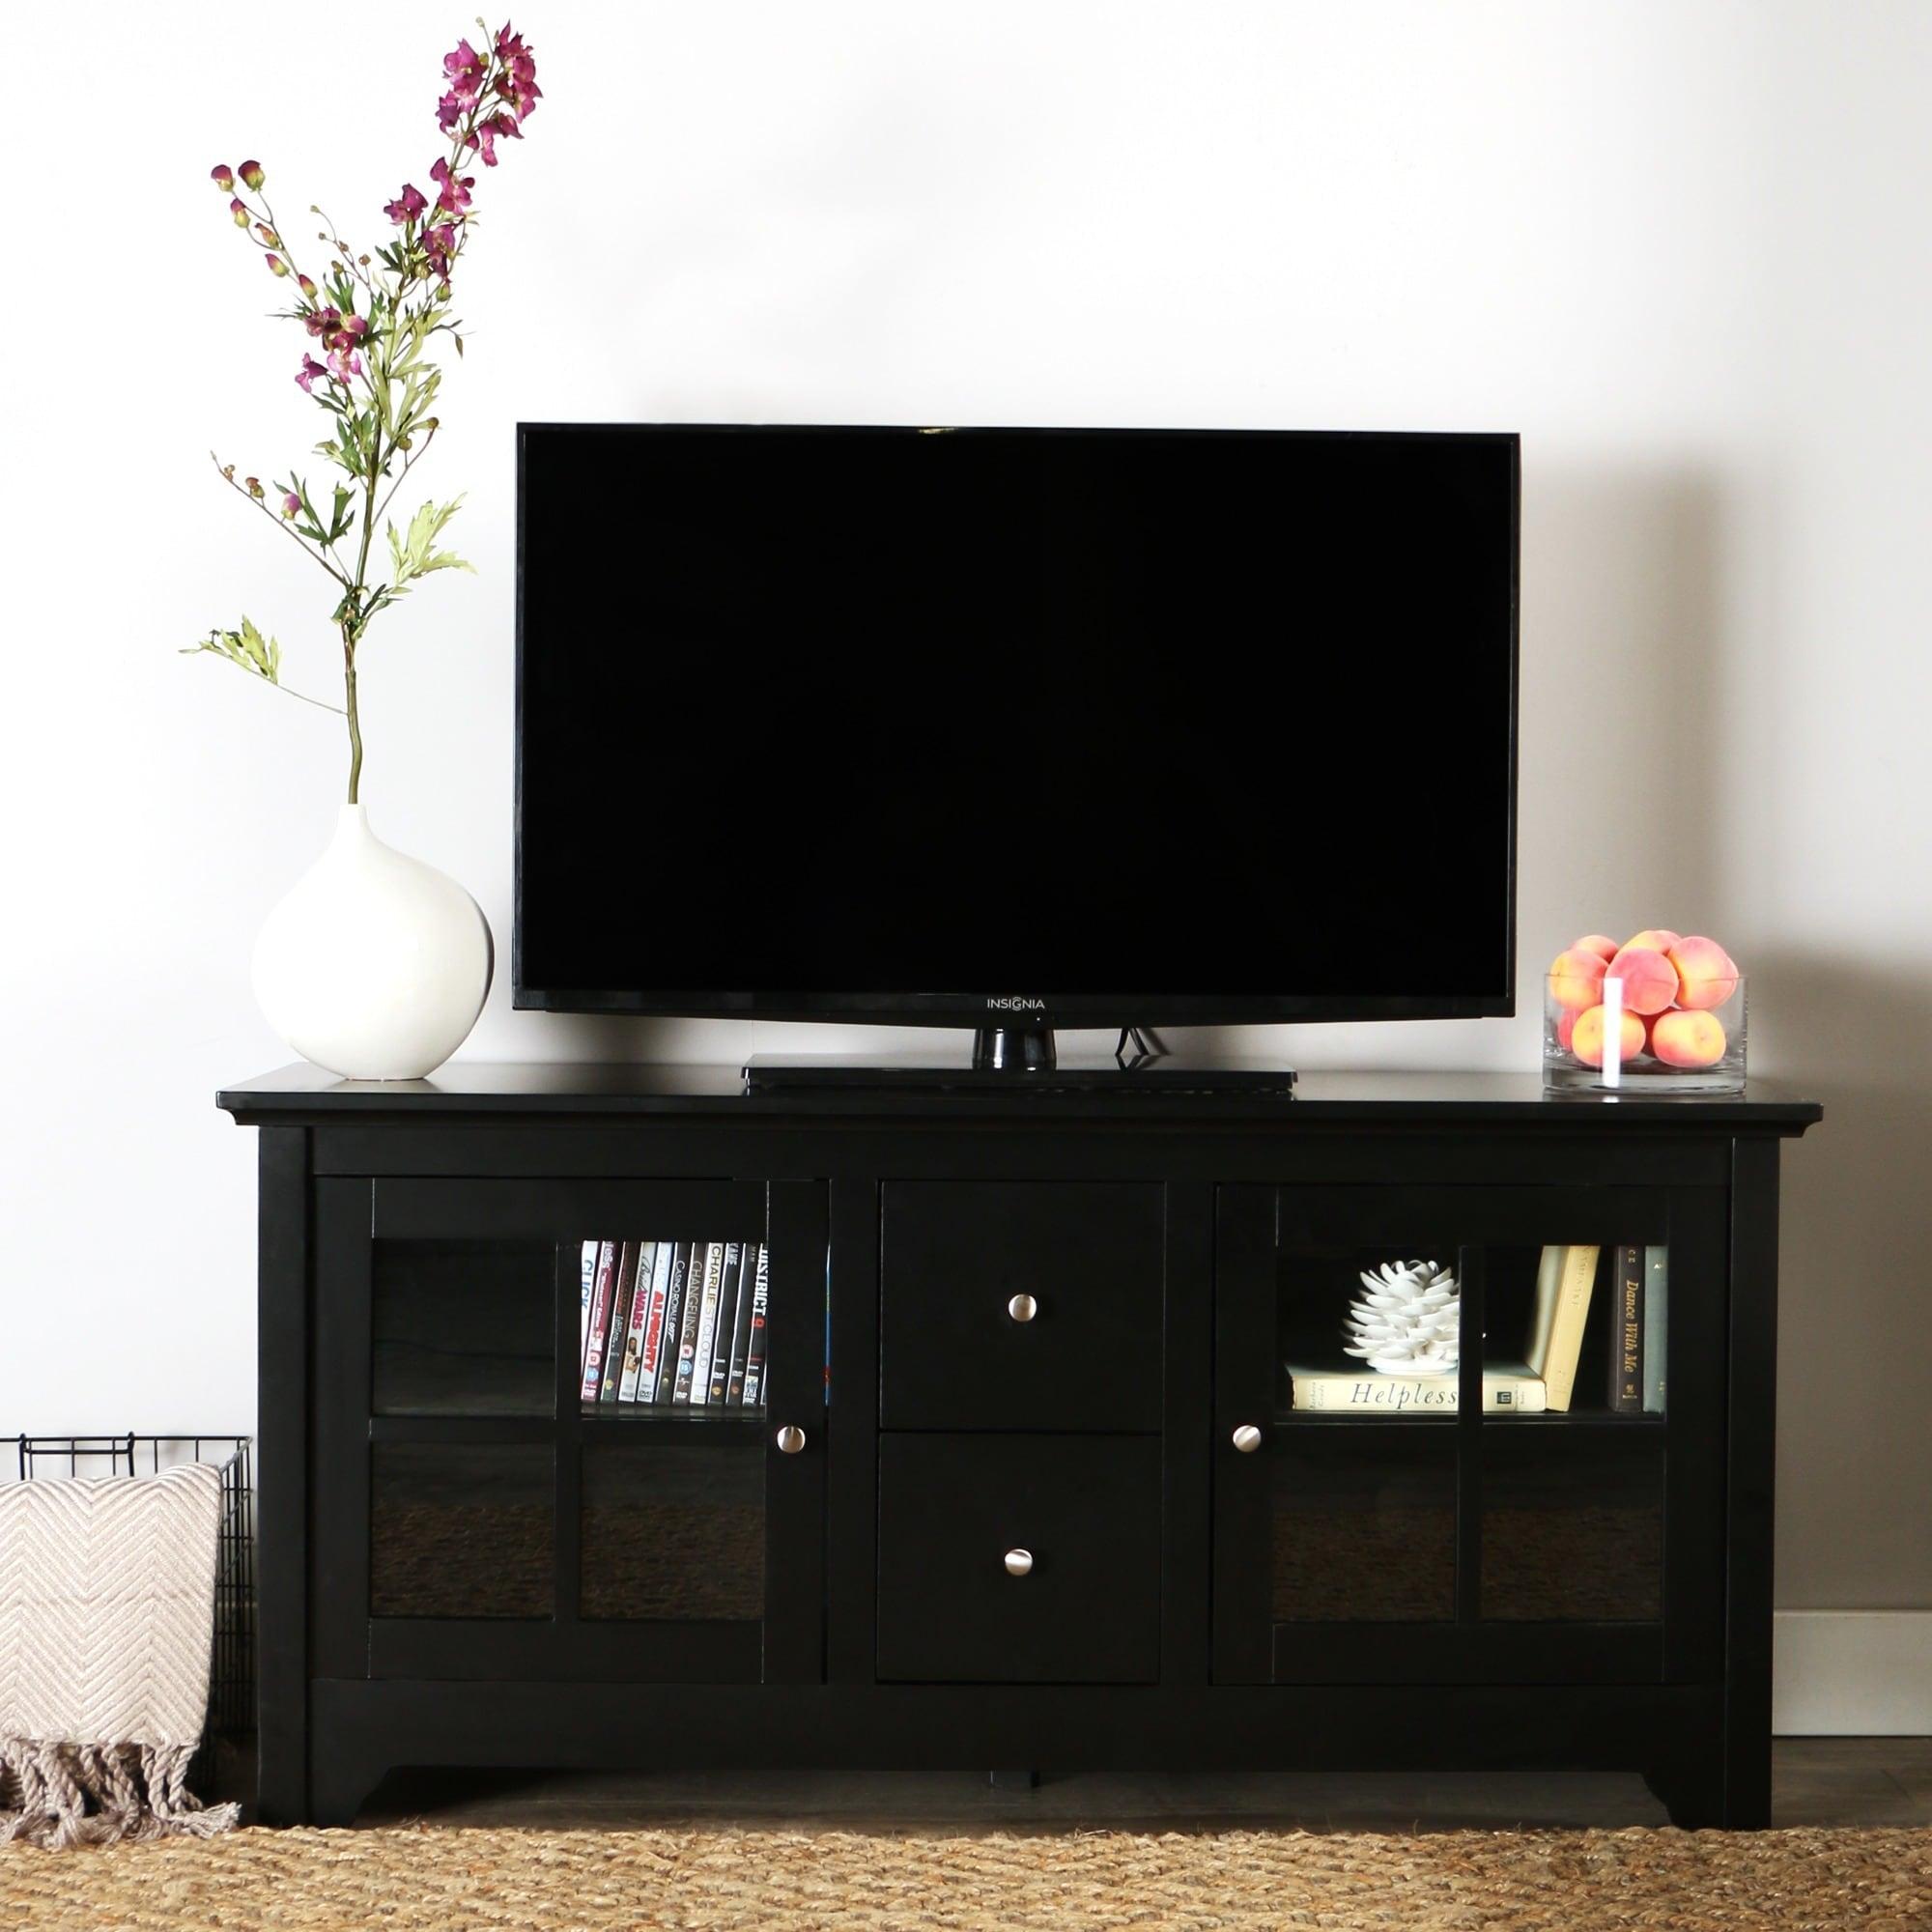 Shop Porch Den Leona 52 Inch Black Solid Wood Tv Stand On Sale